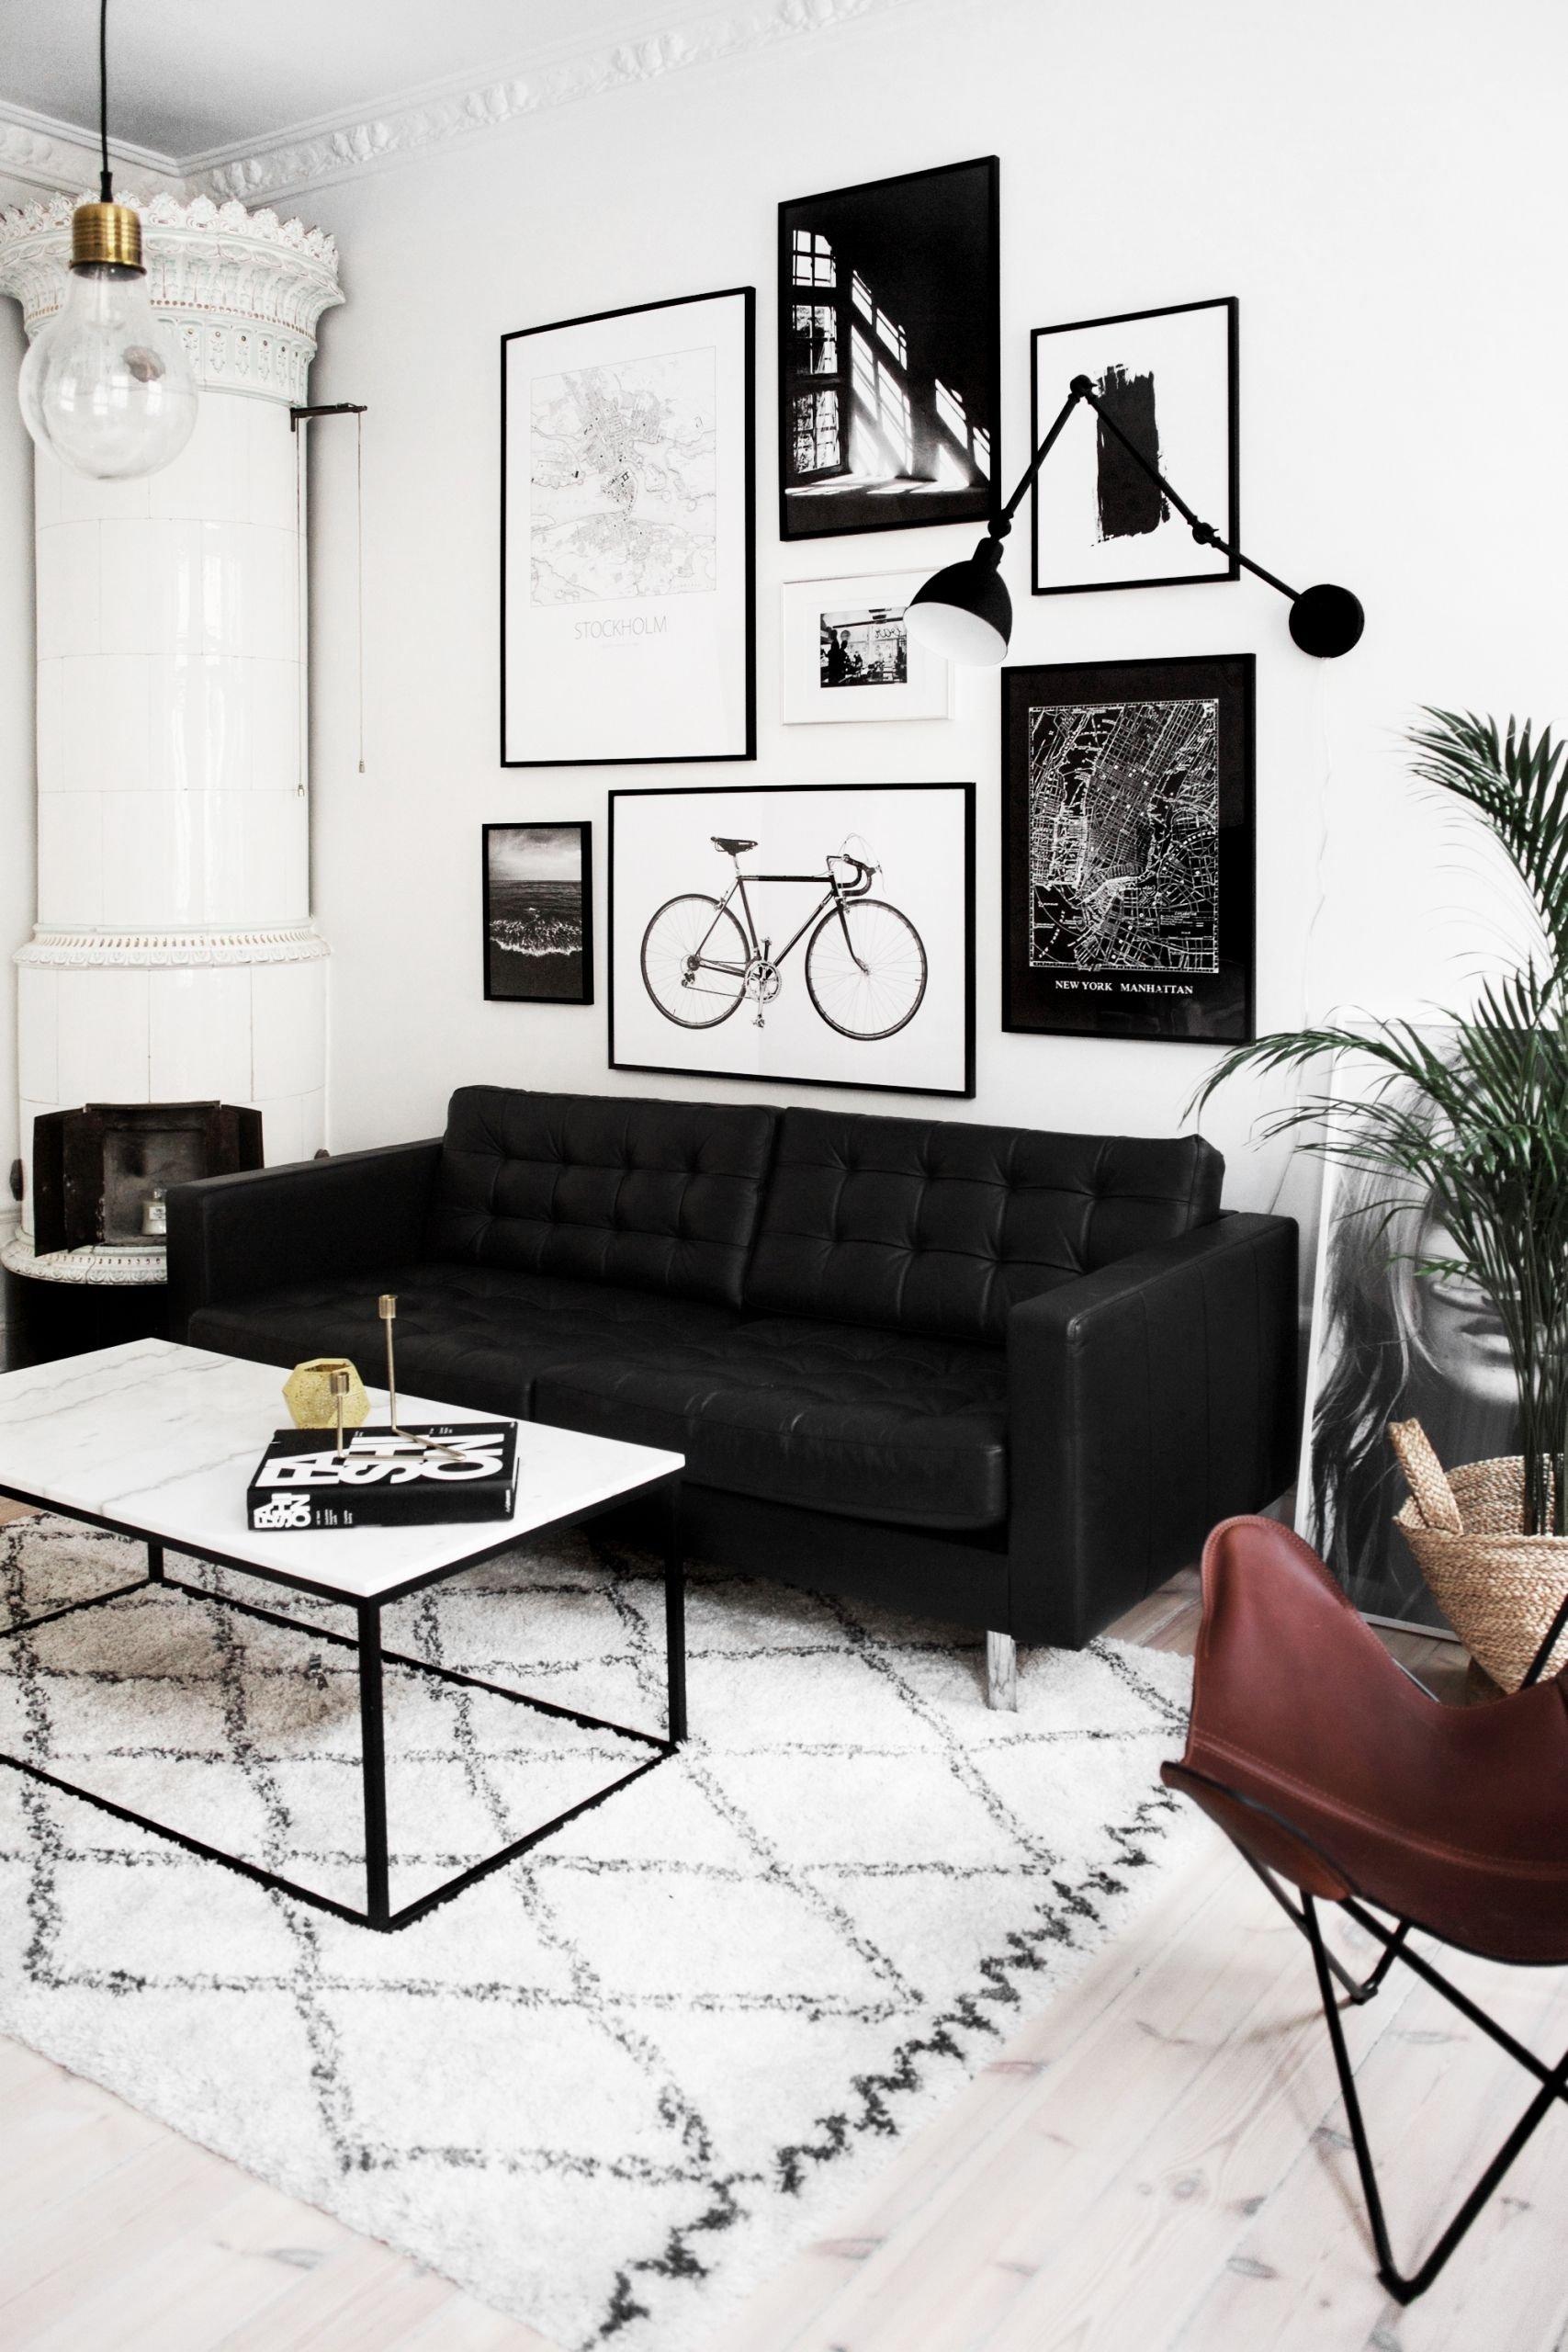 10 Fashionable Black Couch Living Room Ideas livingroom2 pinteres